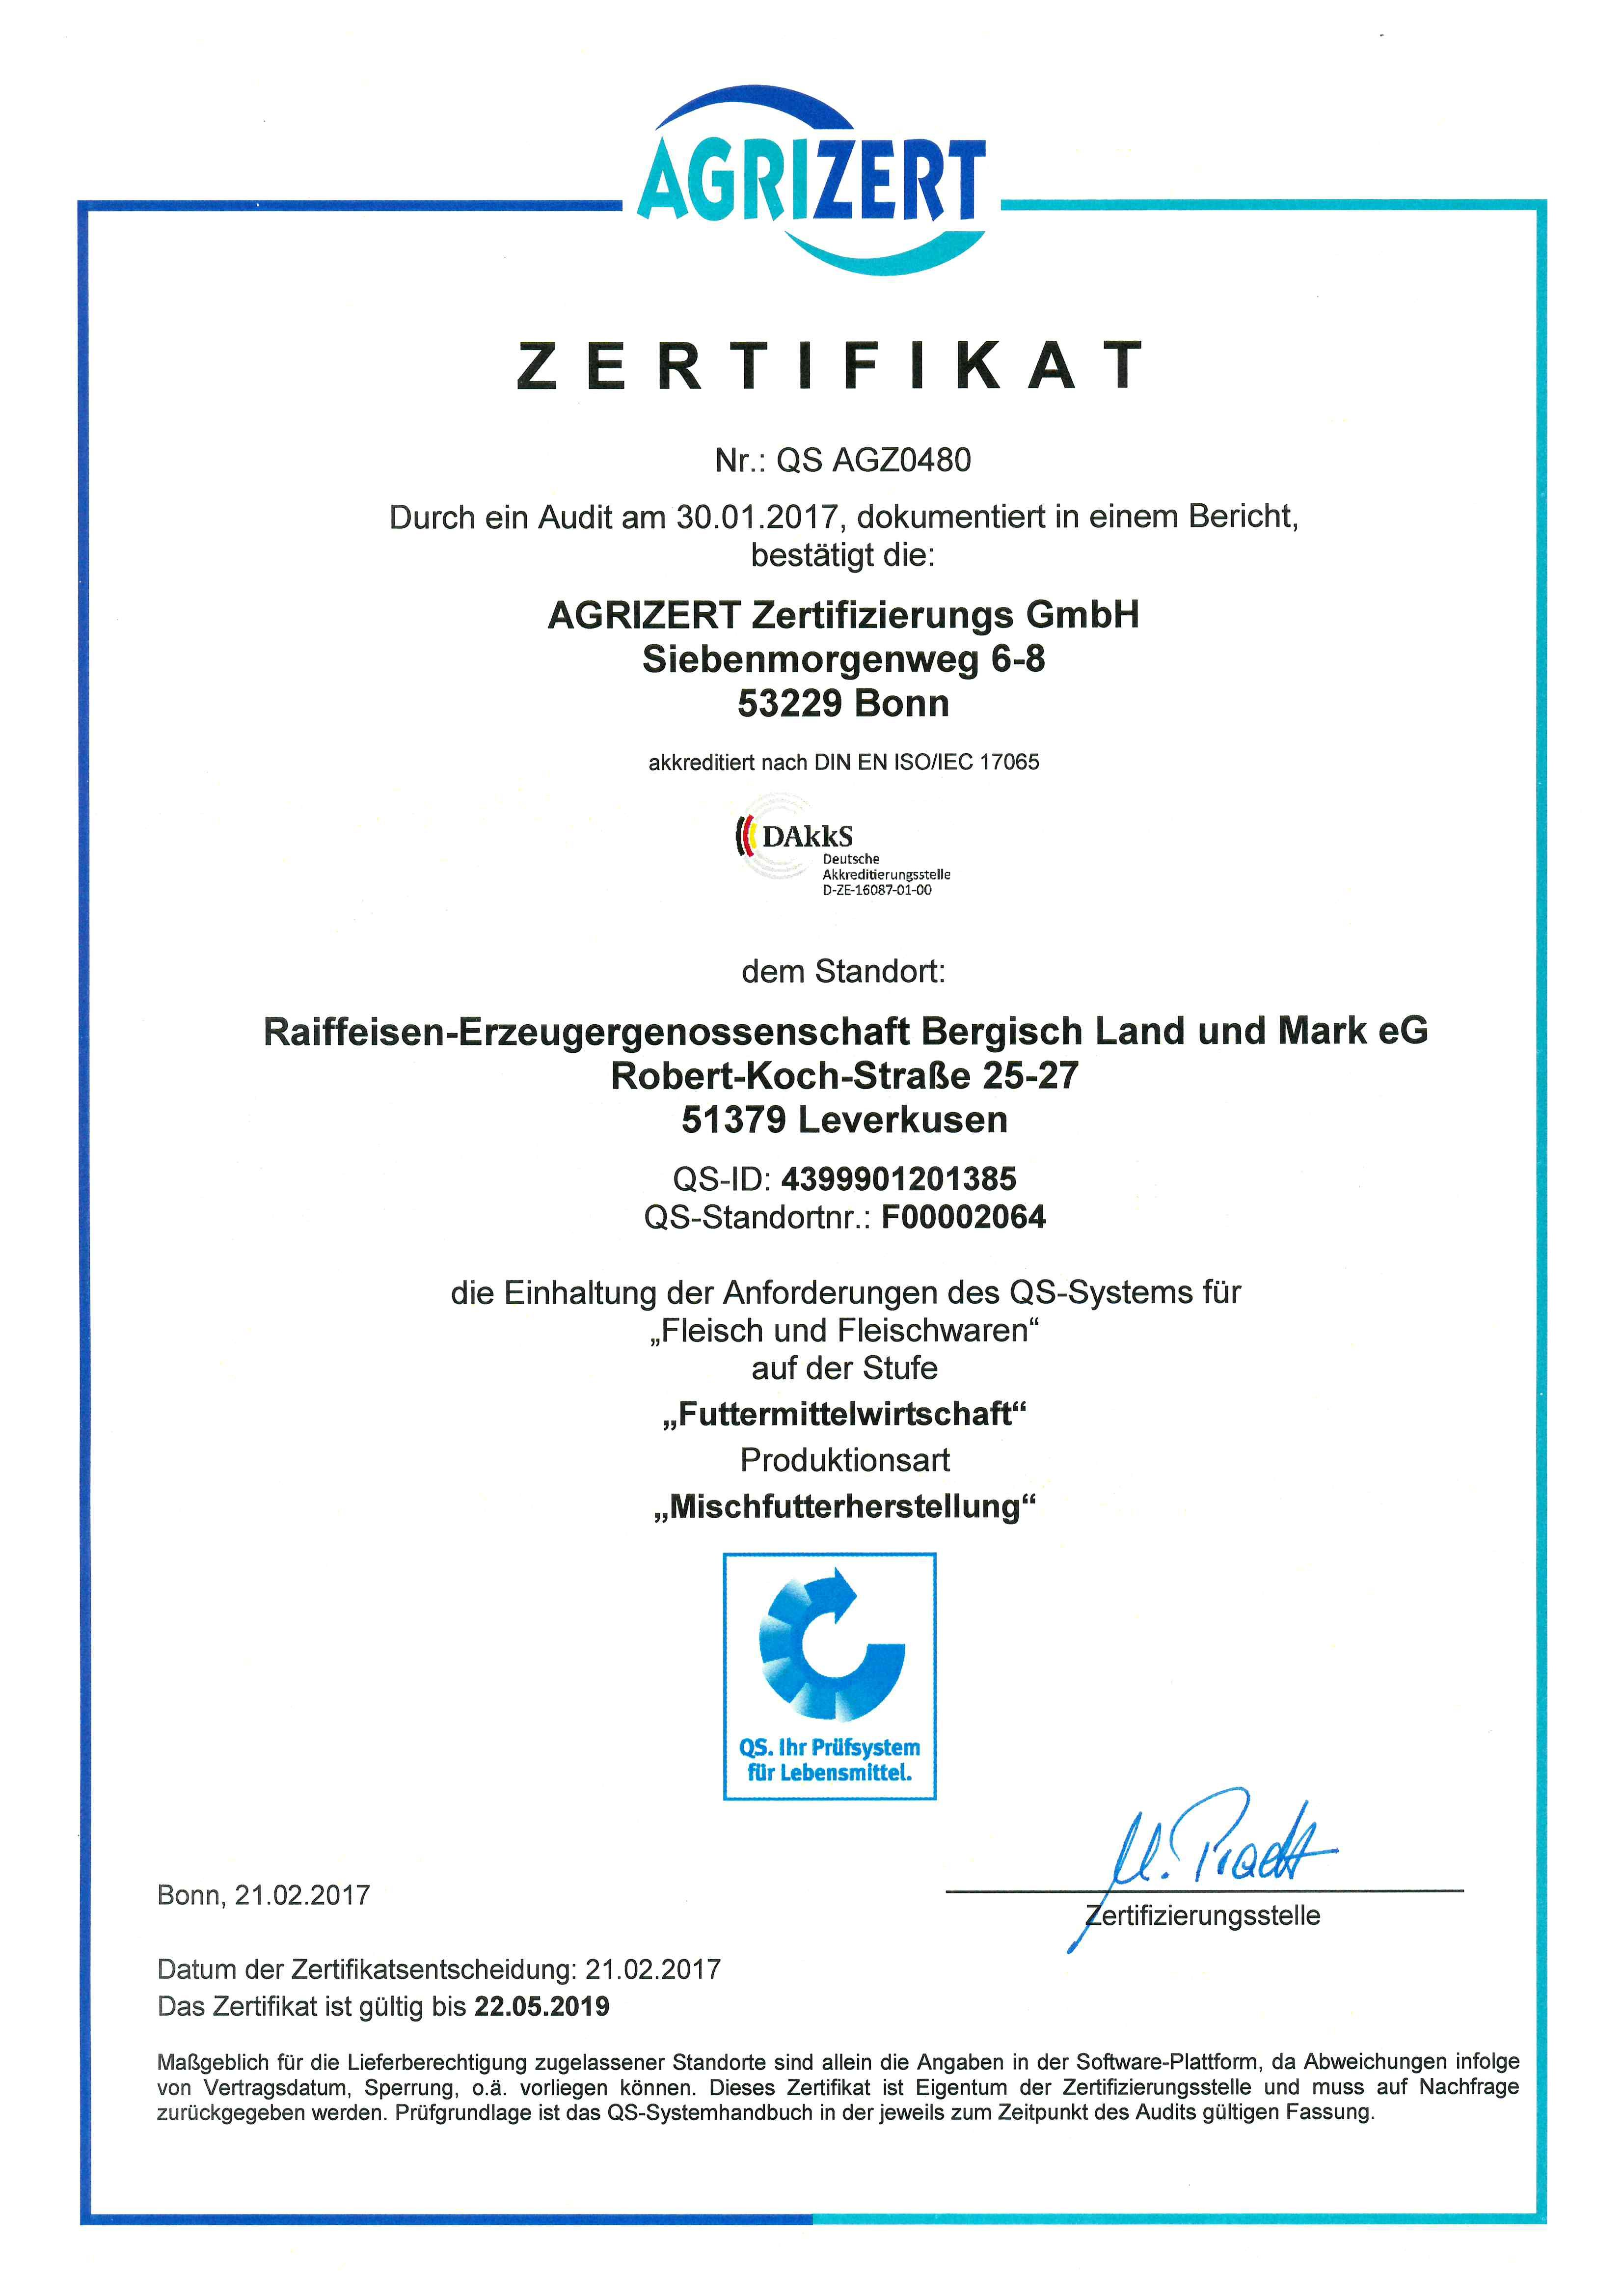 Zertifikat_Agrizert_2017_02_21.jpg